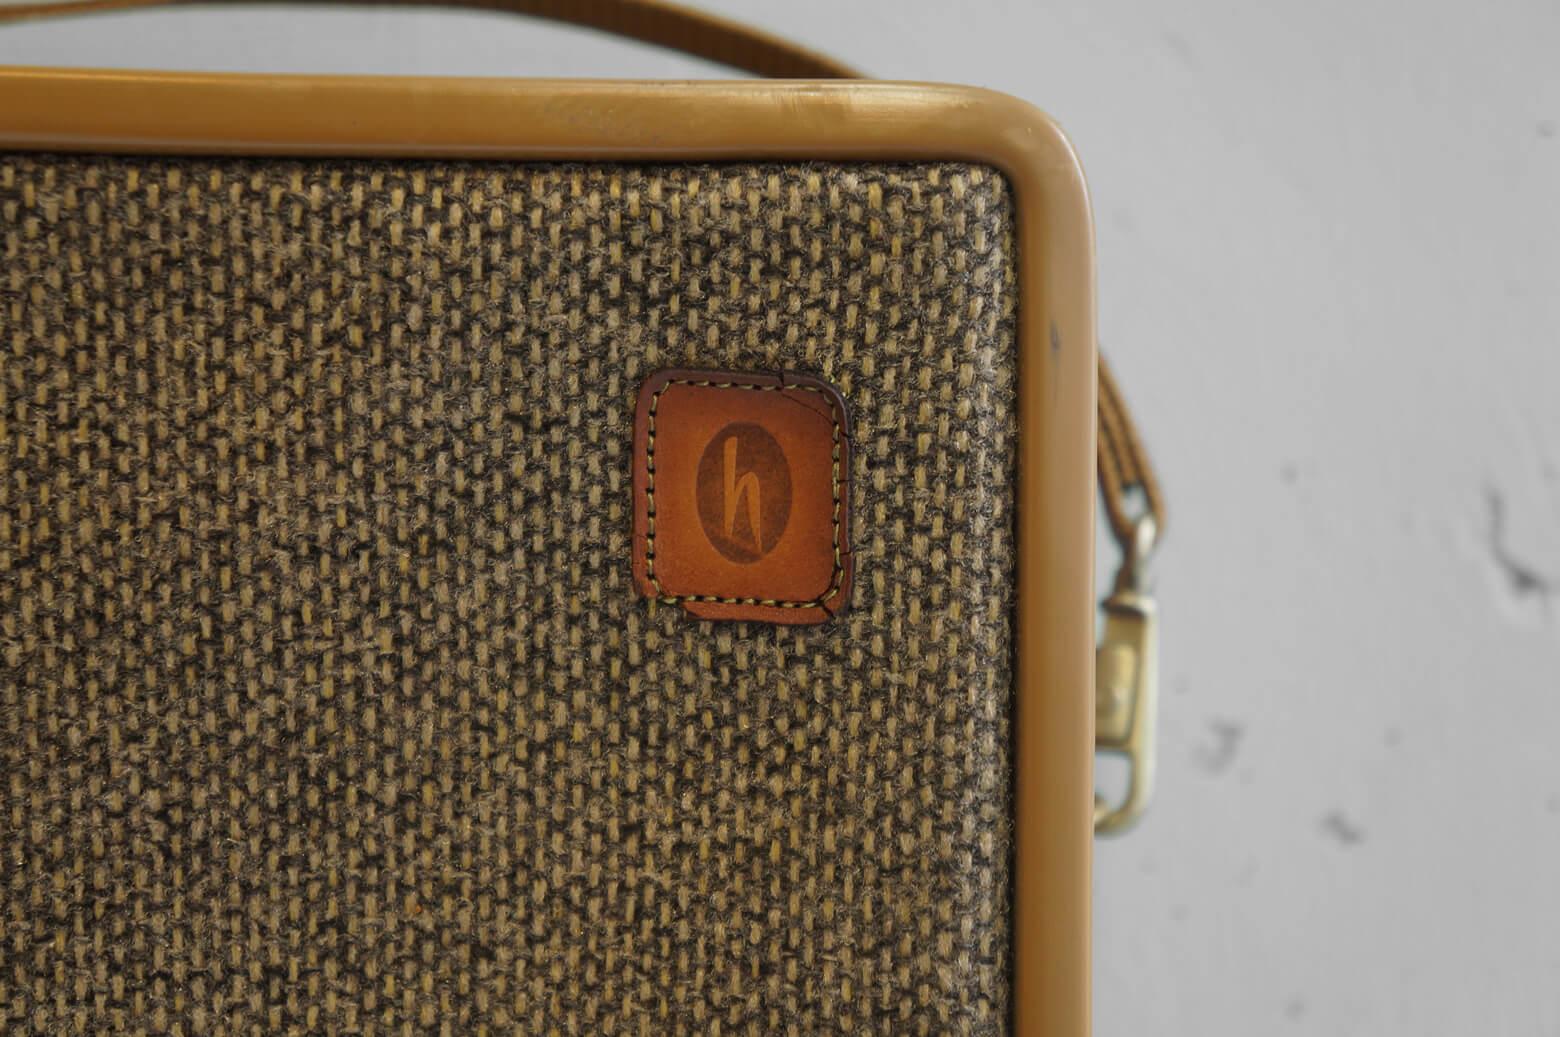 hartmann Vintage TWEED BELTING Travel Bag/ハートマン ヴィンテージ ツイードベルティング トラベルバッグ 大